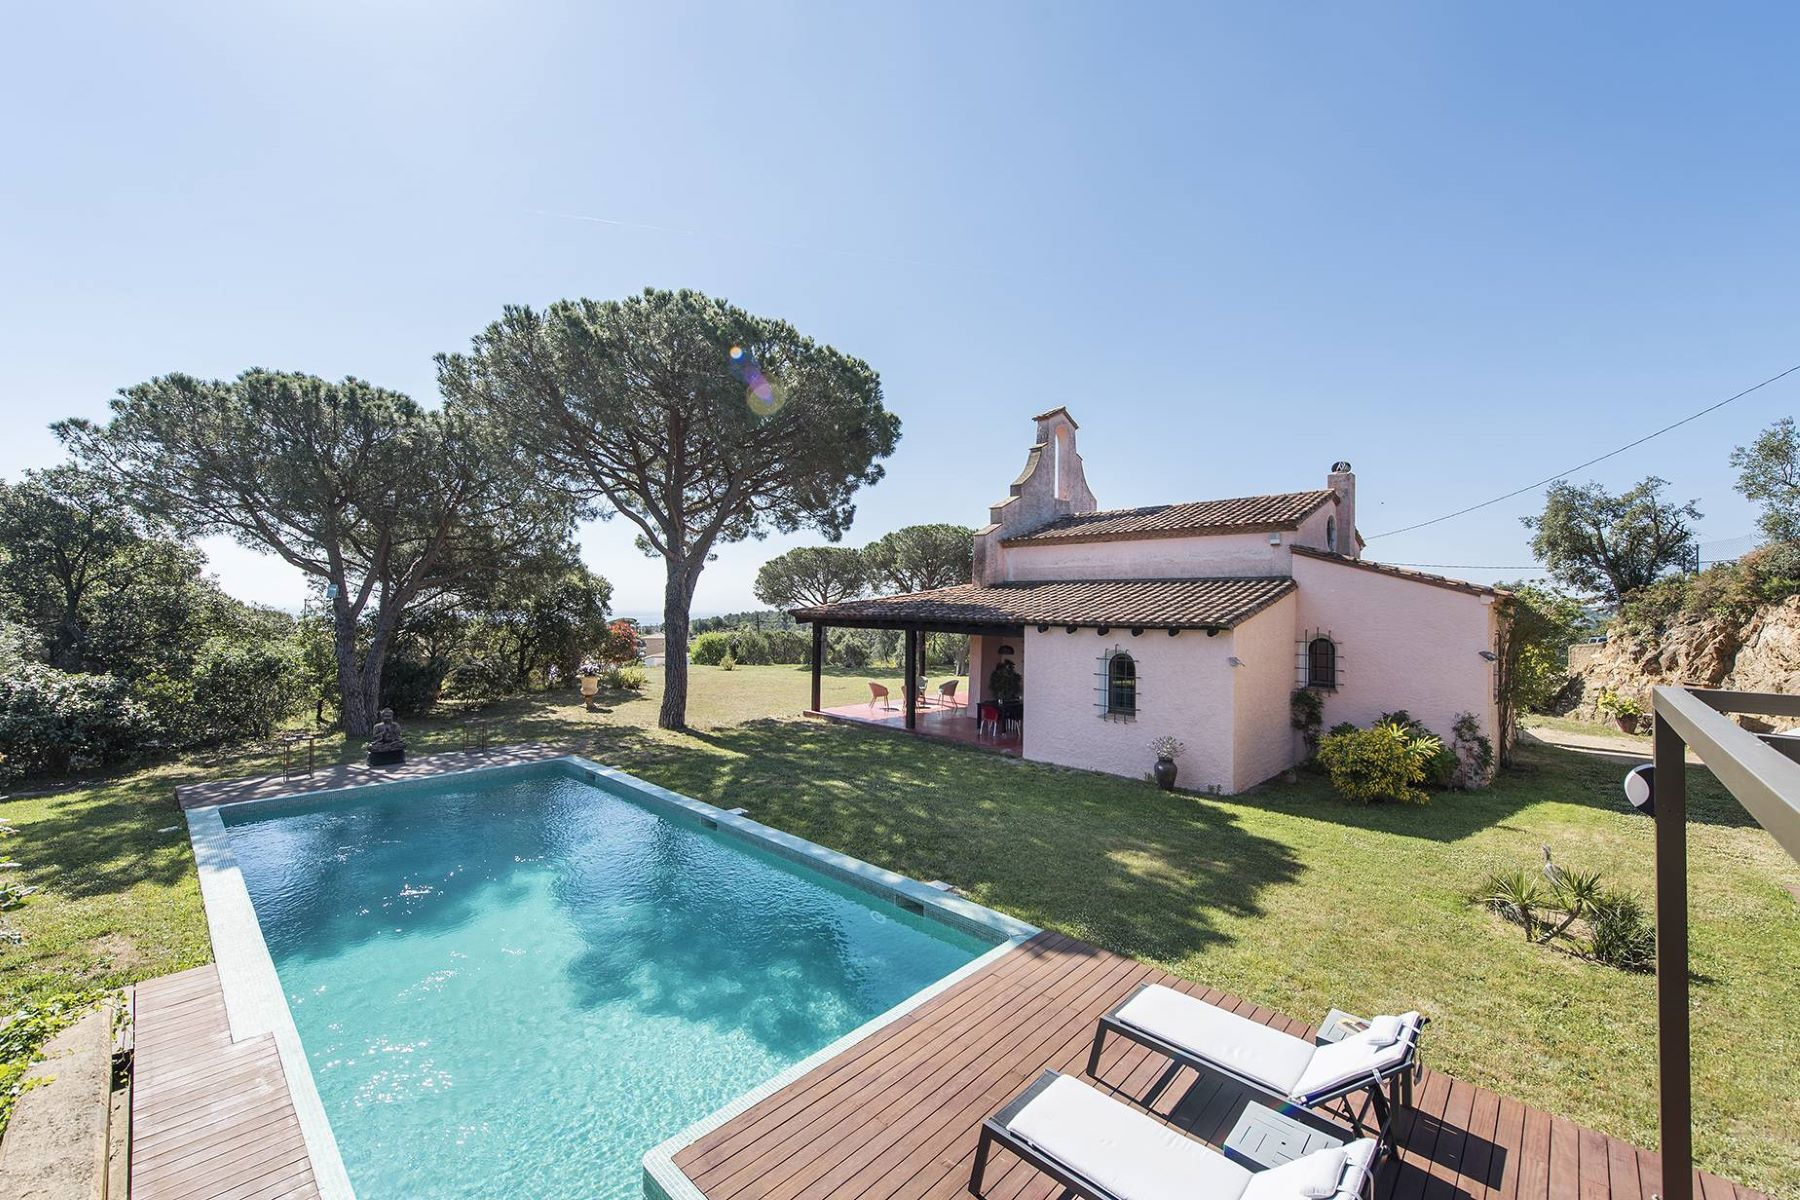 Single Family Home for Sale at Restored old chapel with sea views in Playa de Aro Playa De Aro, Costa Brava, 17250 Spain